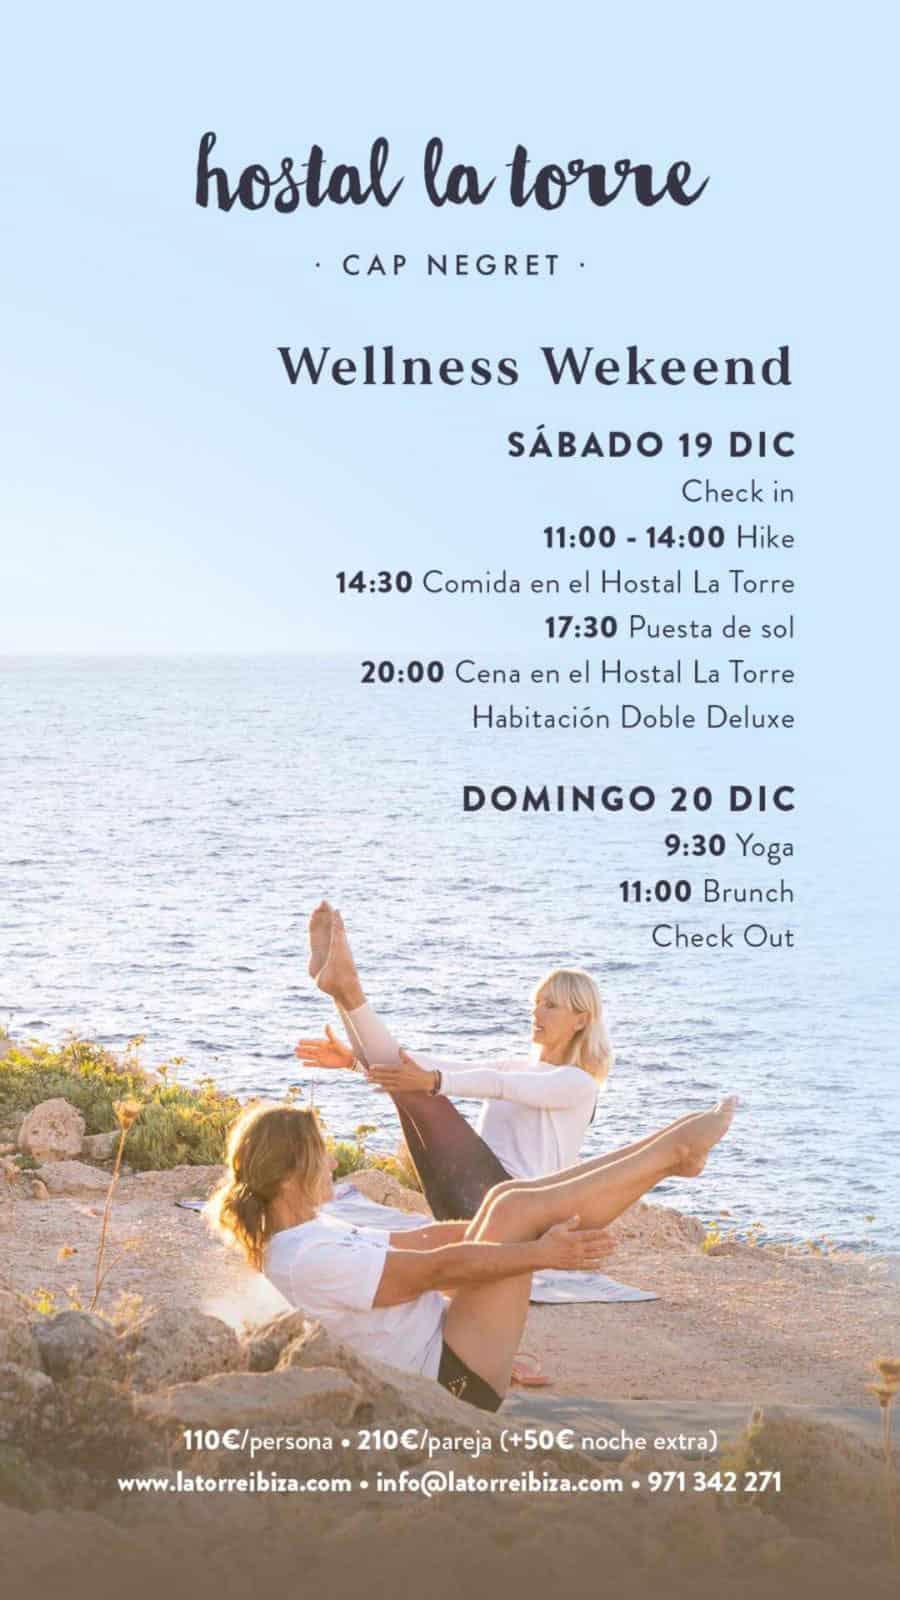 wellness-weekend-hostal-la-torre-Eivissa-2020-welcometoibiza